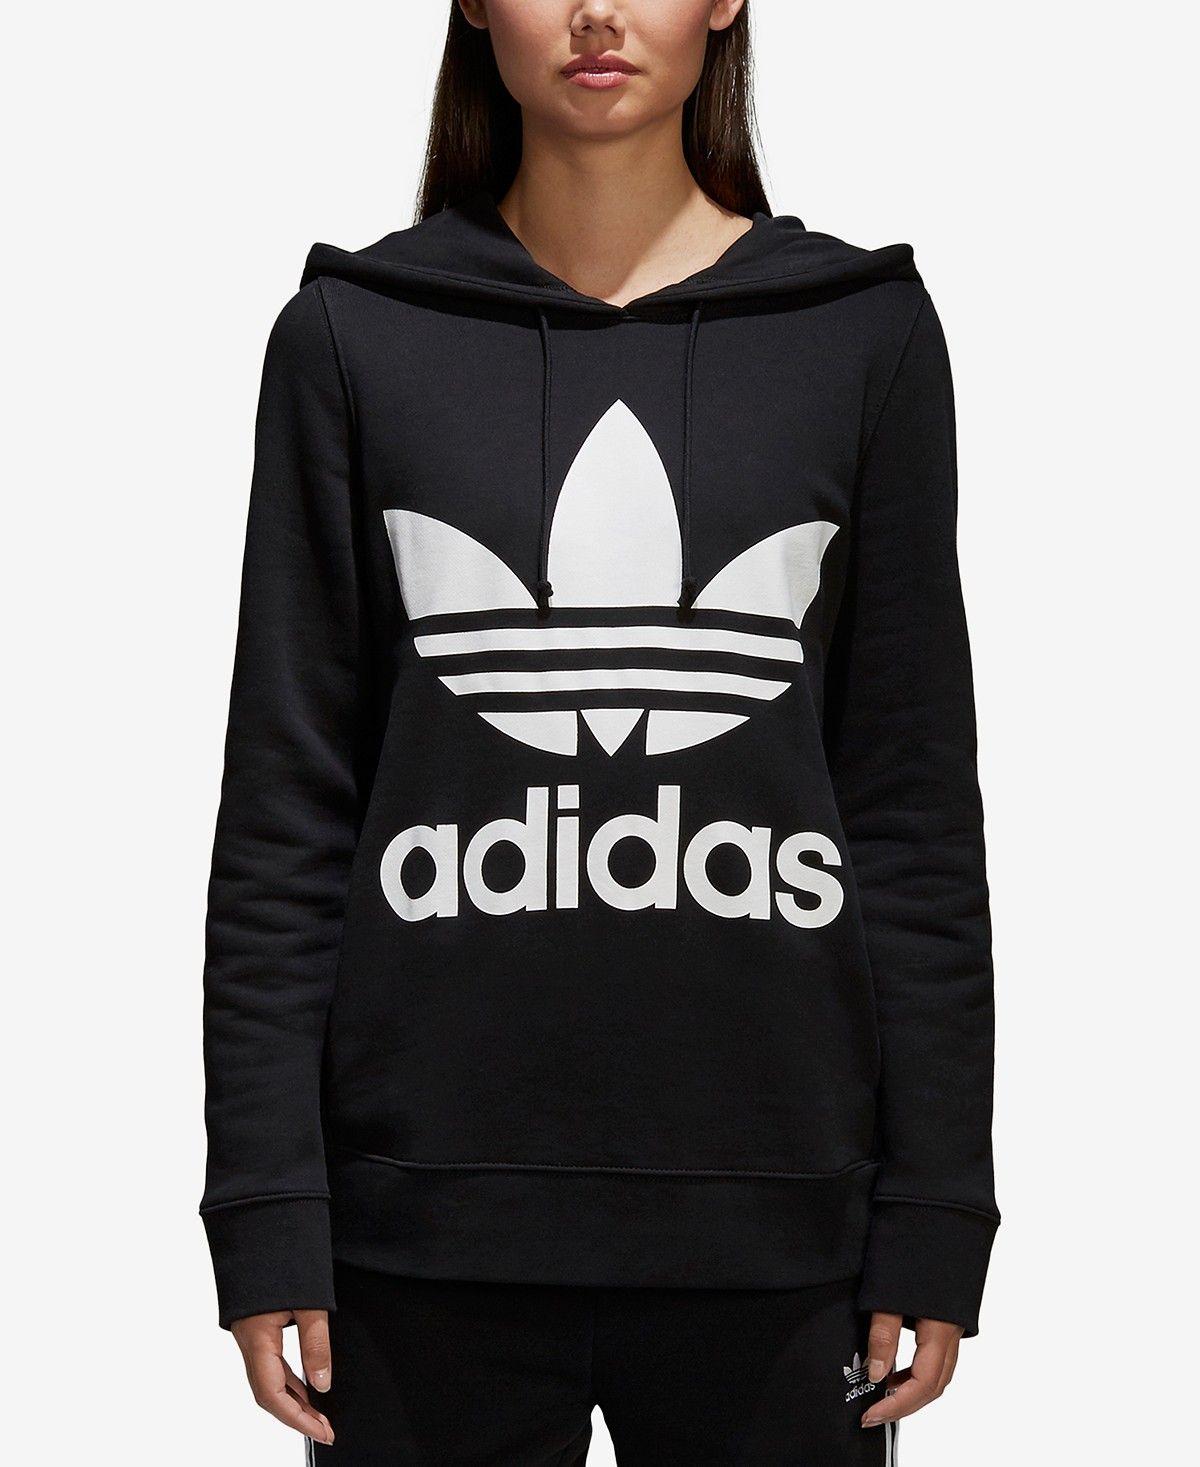 Adidas Women S Adicolor Cotton Trefoil Hoodie Reviews Tops Women Macy S Roupas [ 1467 x 1200 Pixel ]